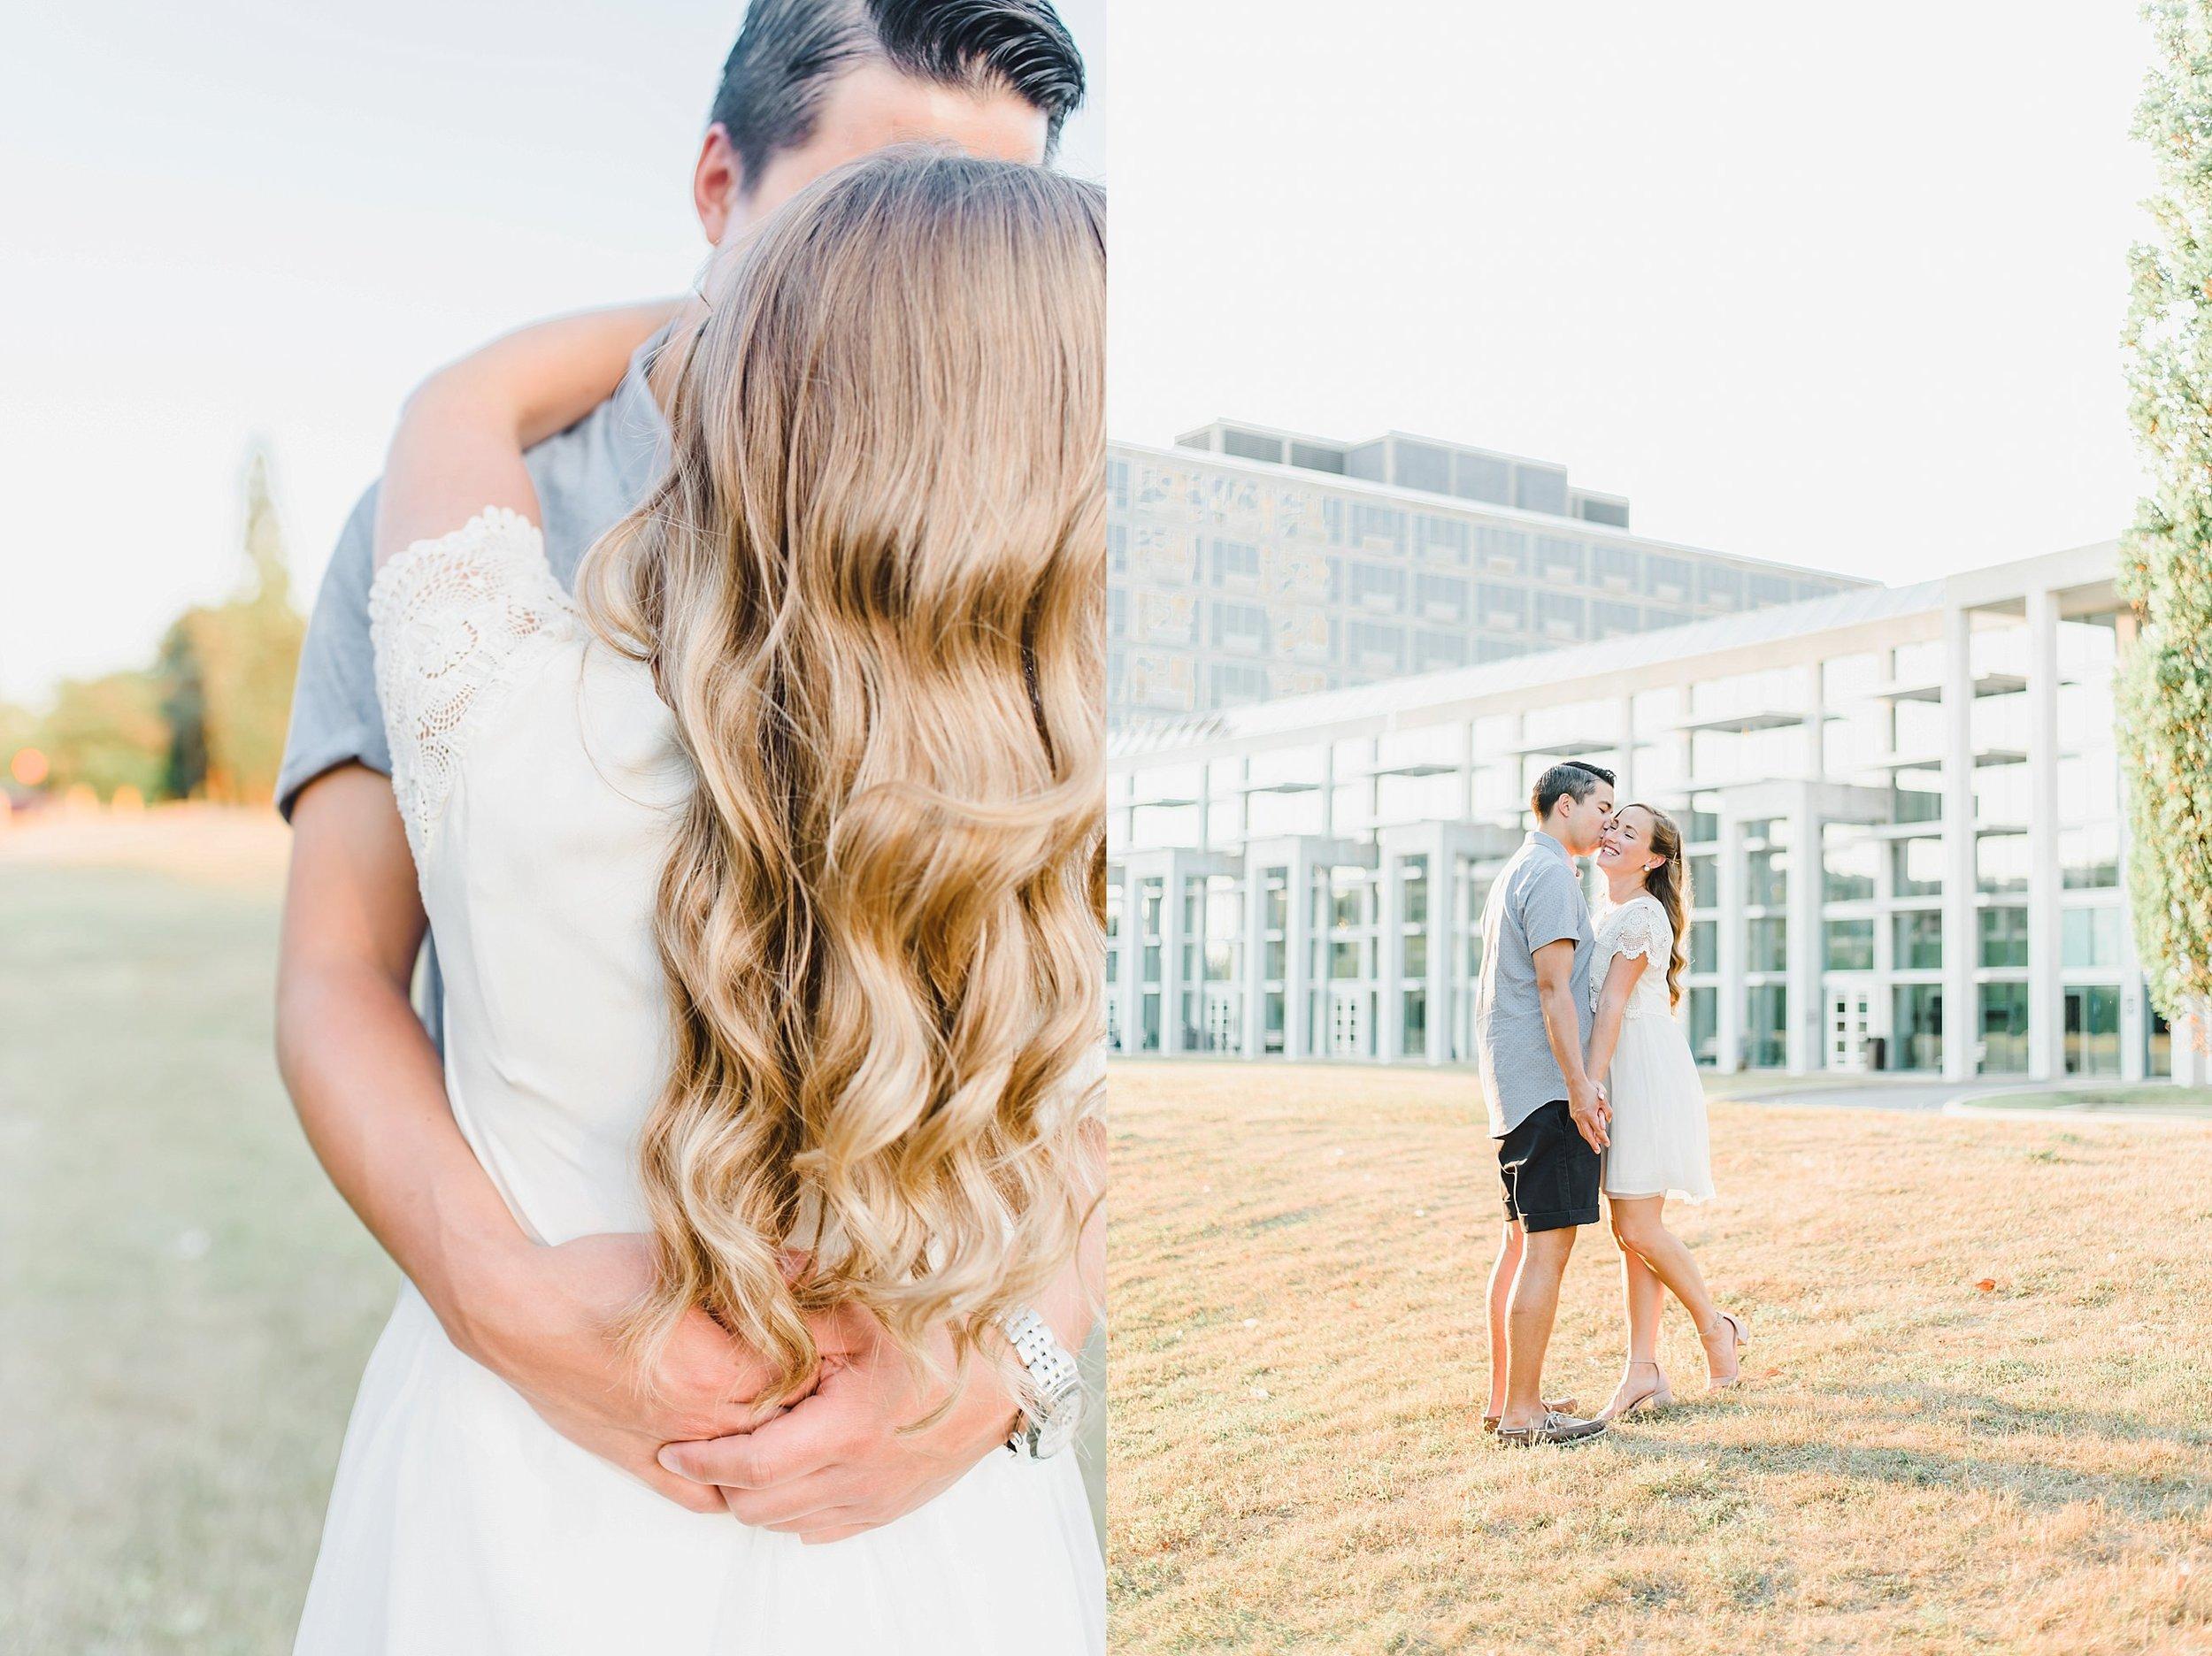 light airy indie fine art ottawa wedding photographer   Ali and Batoul Photography_0270.jpg